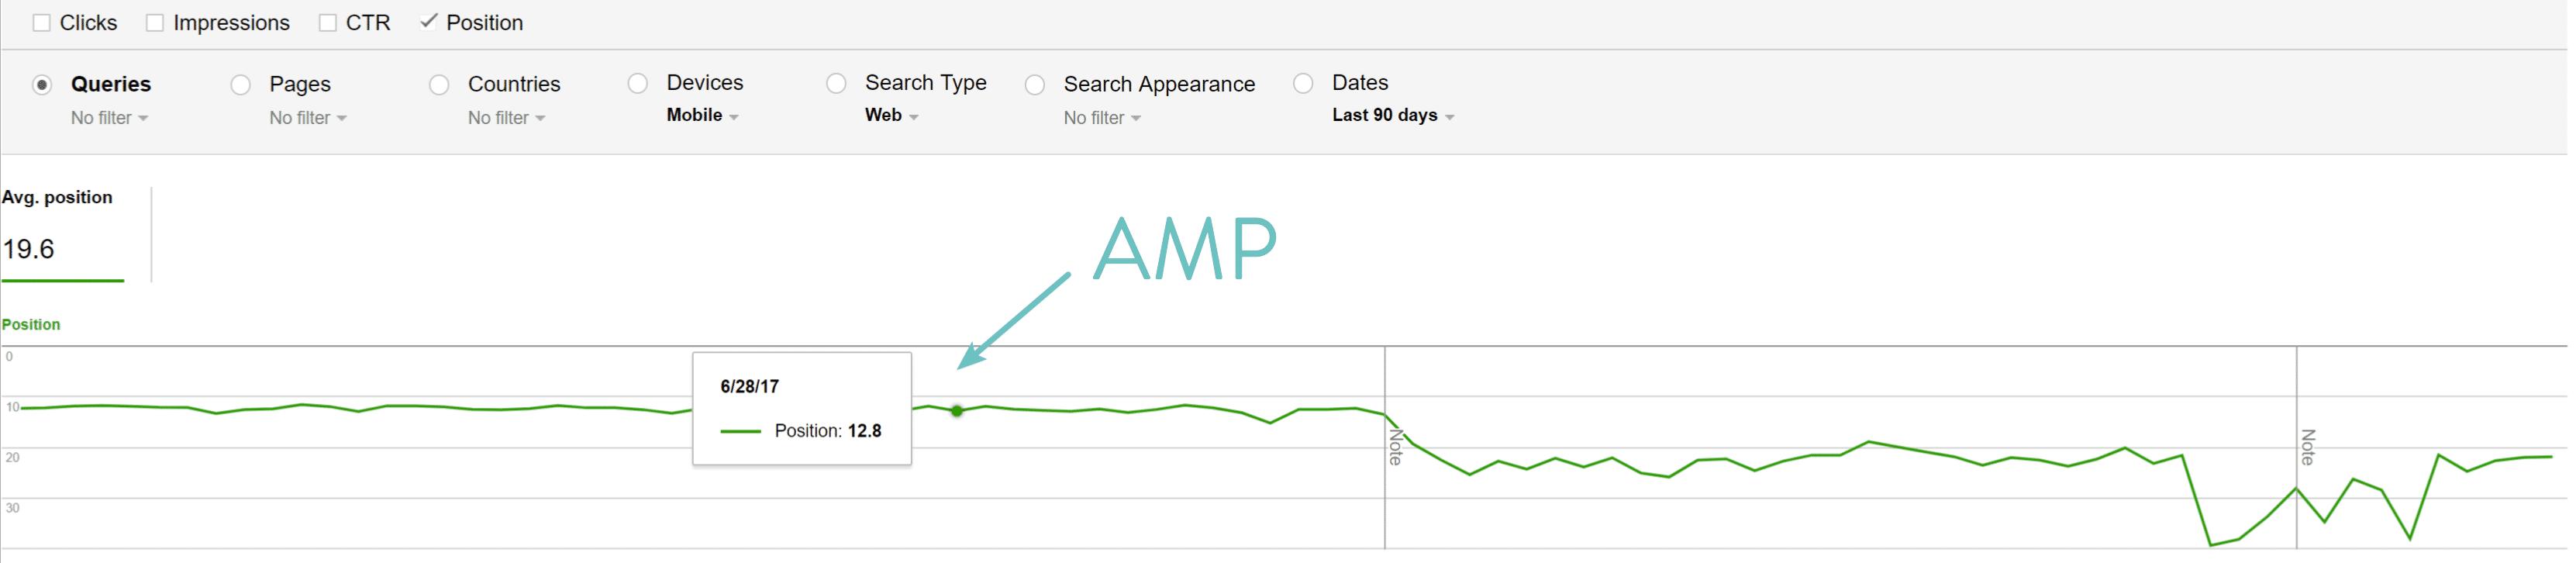 Google AMP Positionsdaten